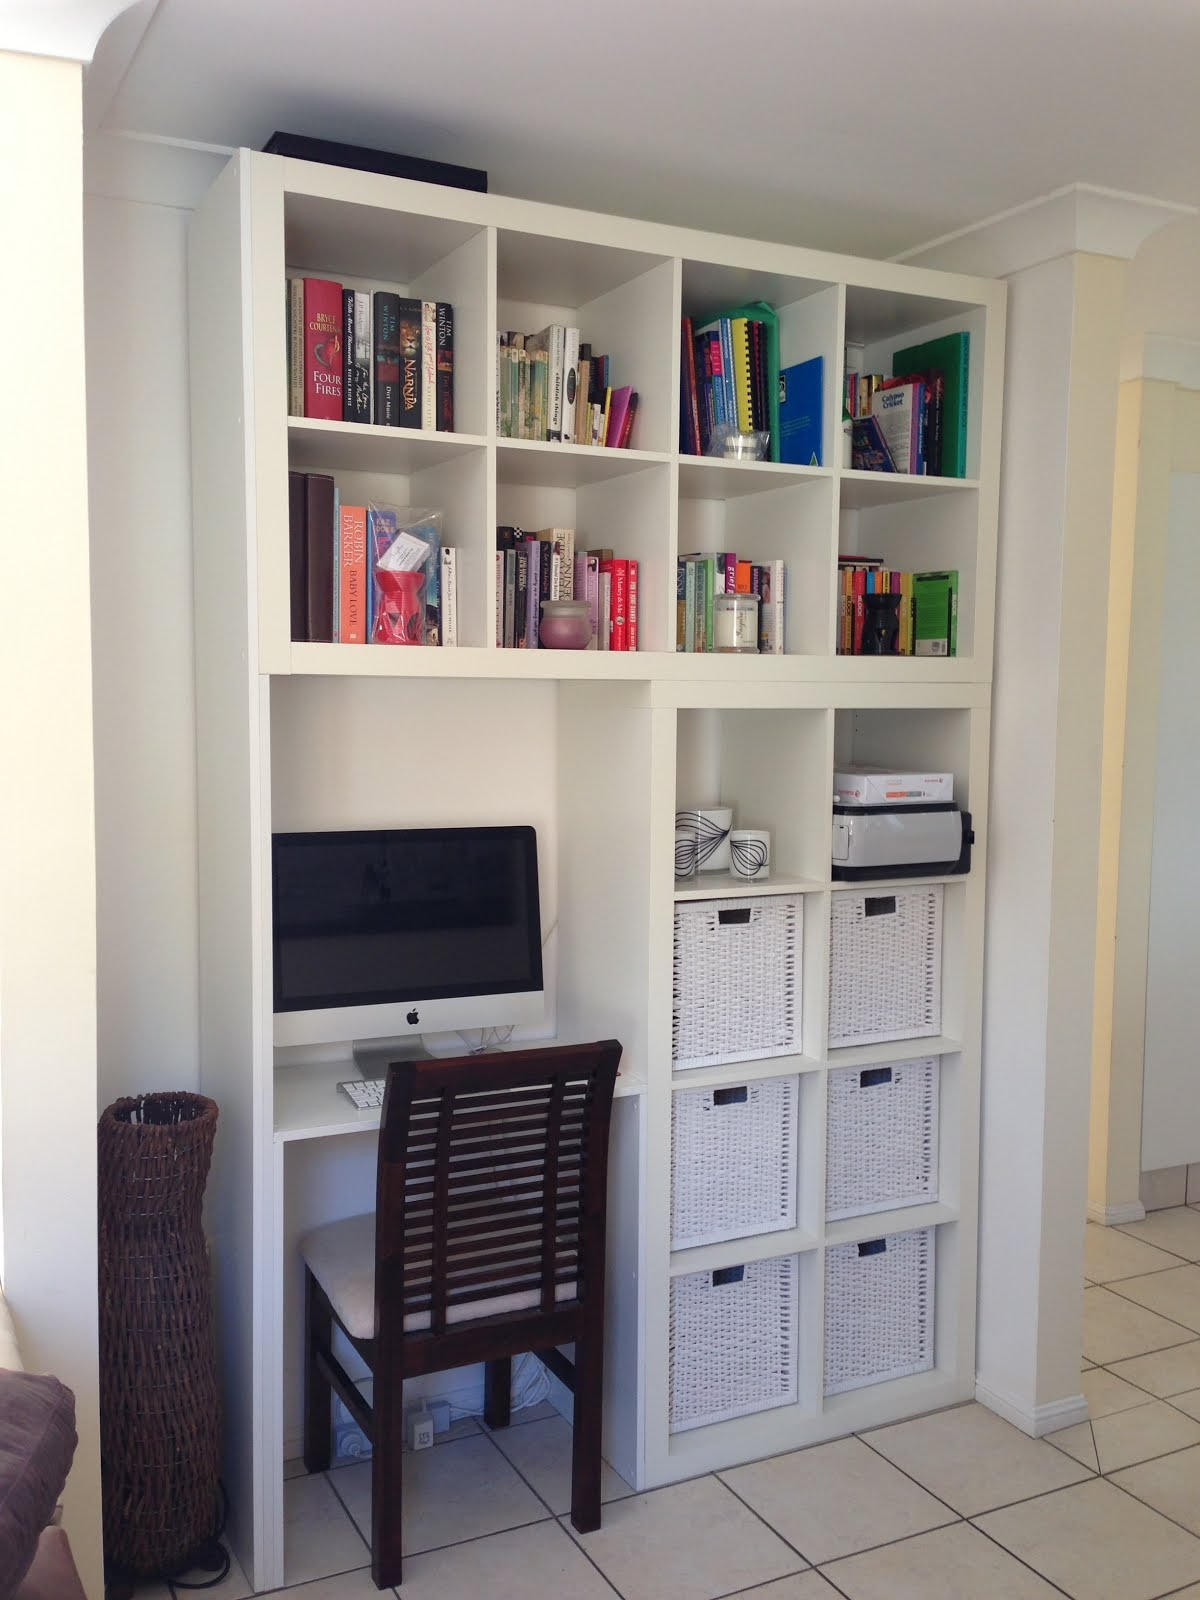 S White Melamine Kitchen Cabinets With The Oak Trim